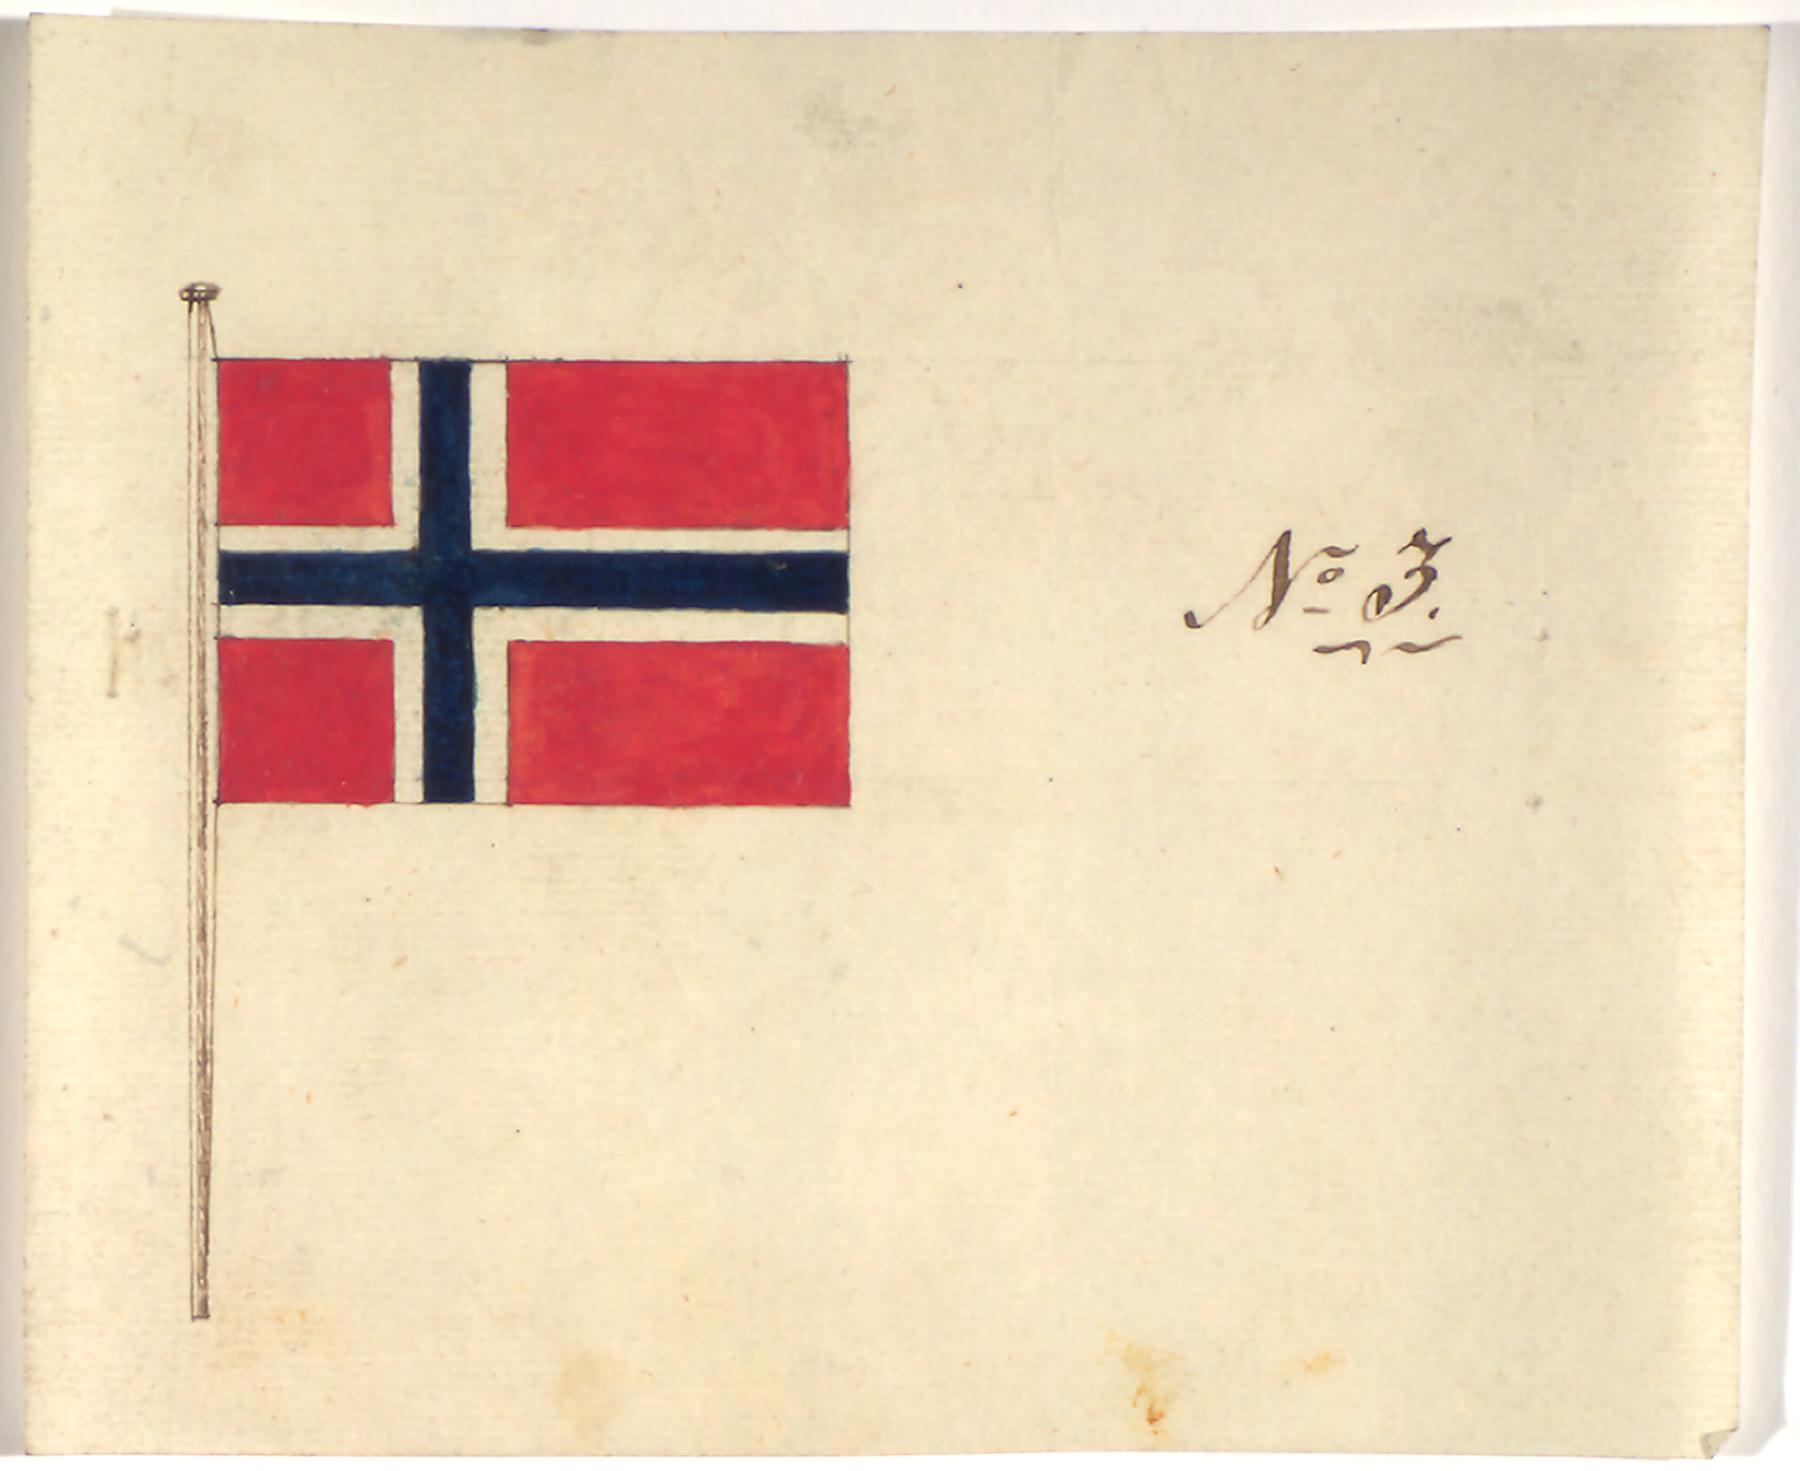 norsk knulling date forslag